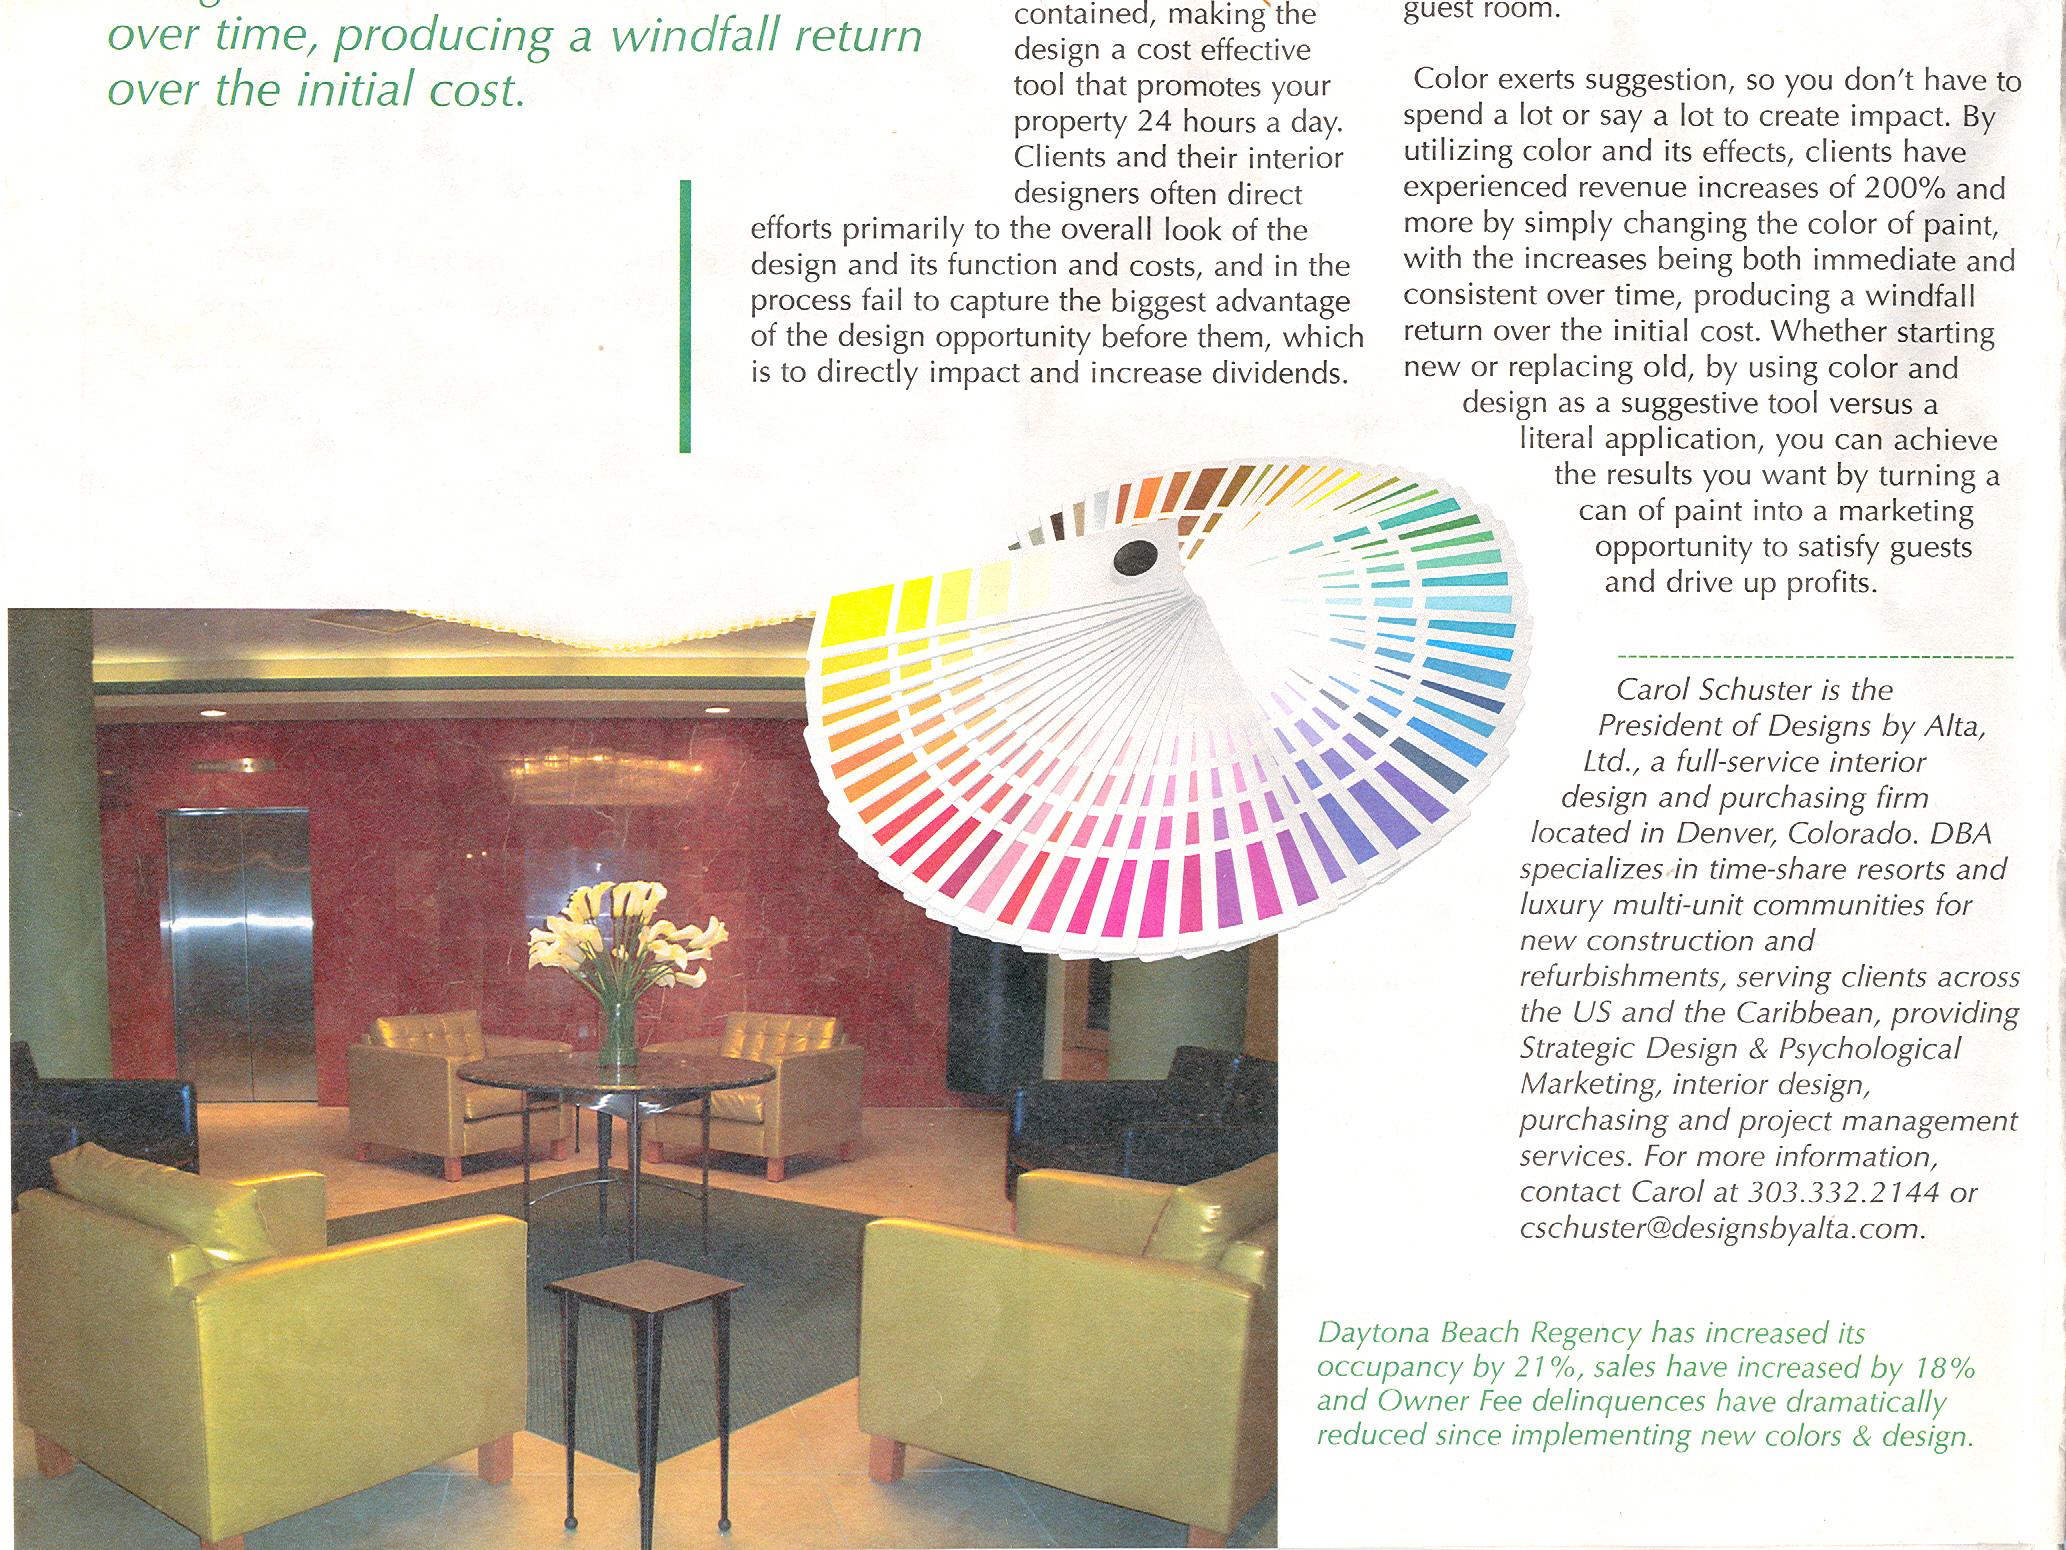 Leveraging Color Design For Revenues Page 2